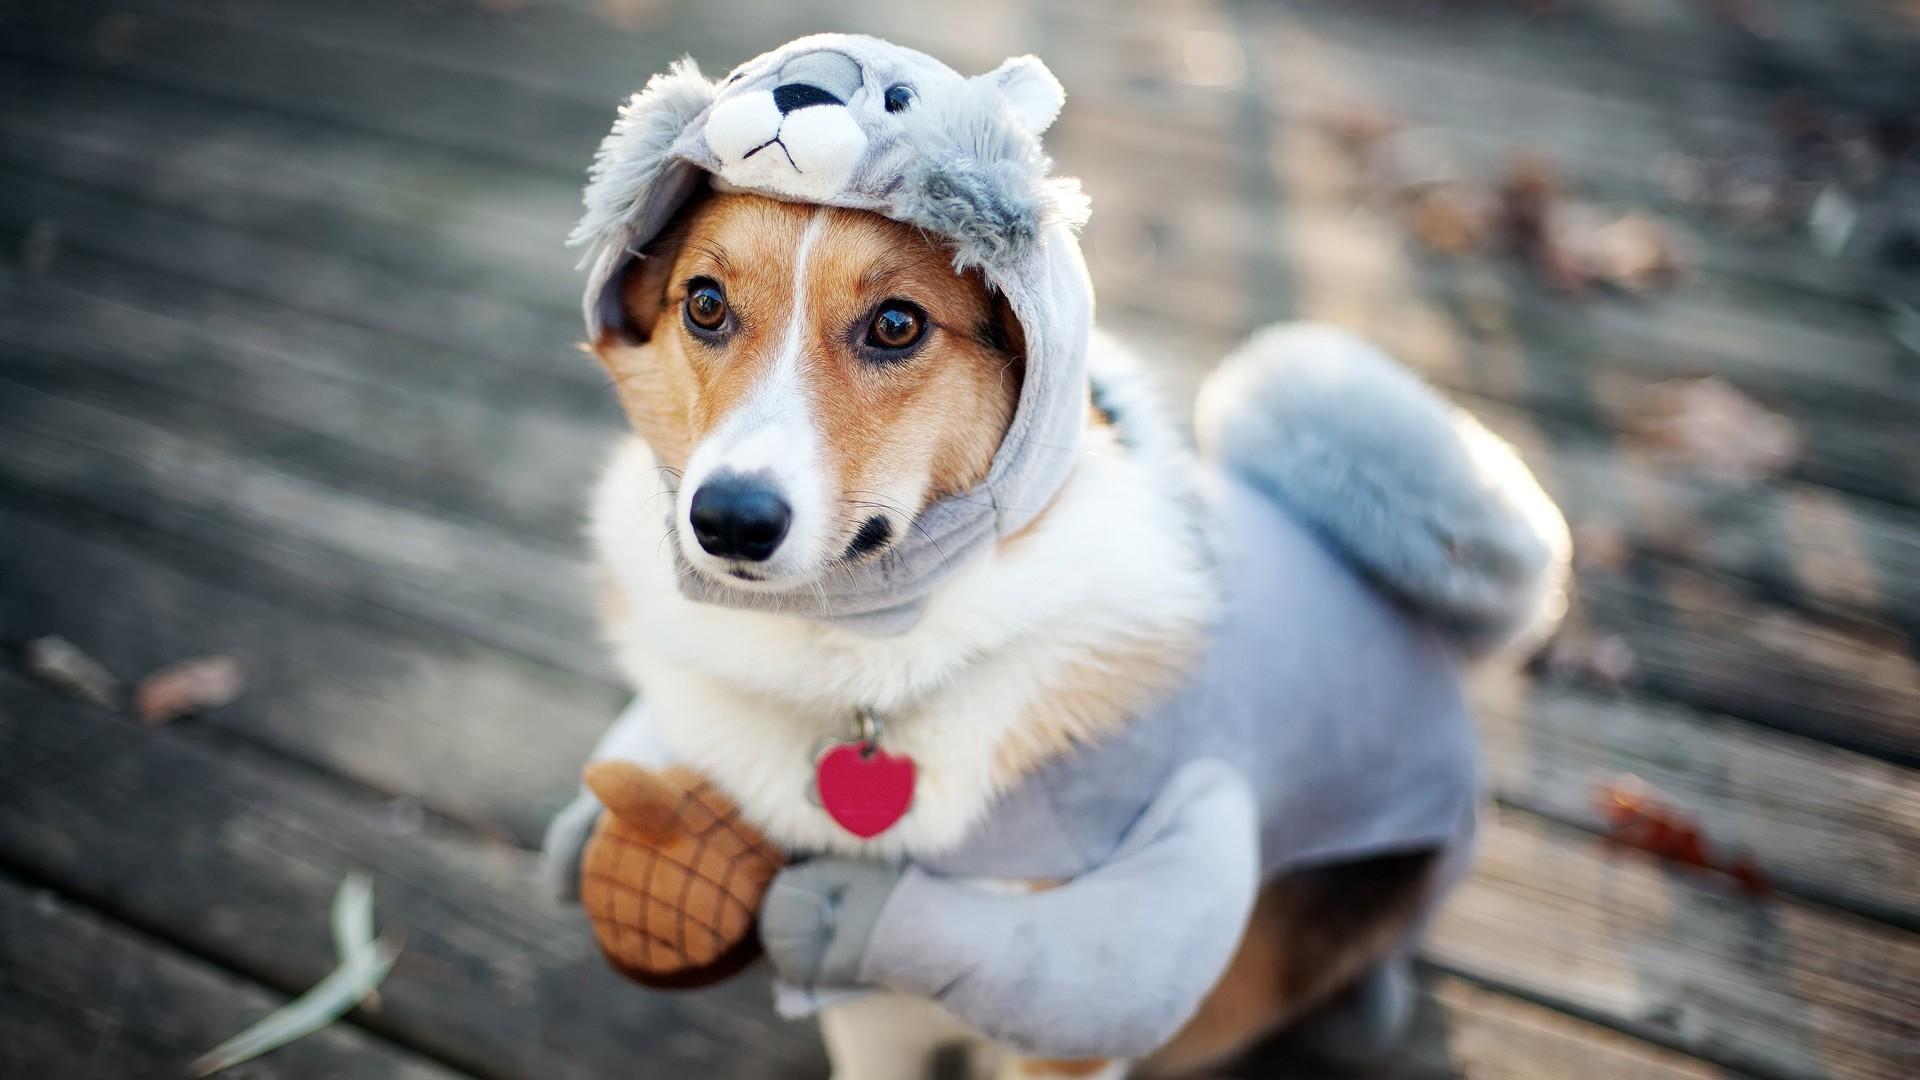 Funny Sweet Dog Costume Animal Wallaper